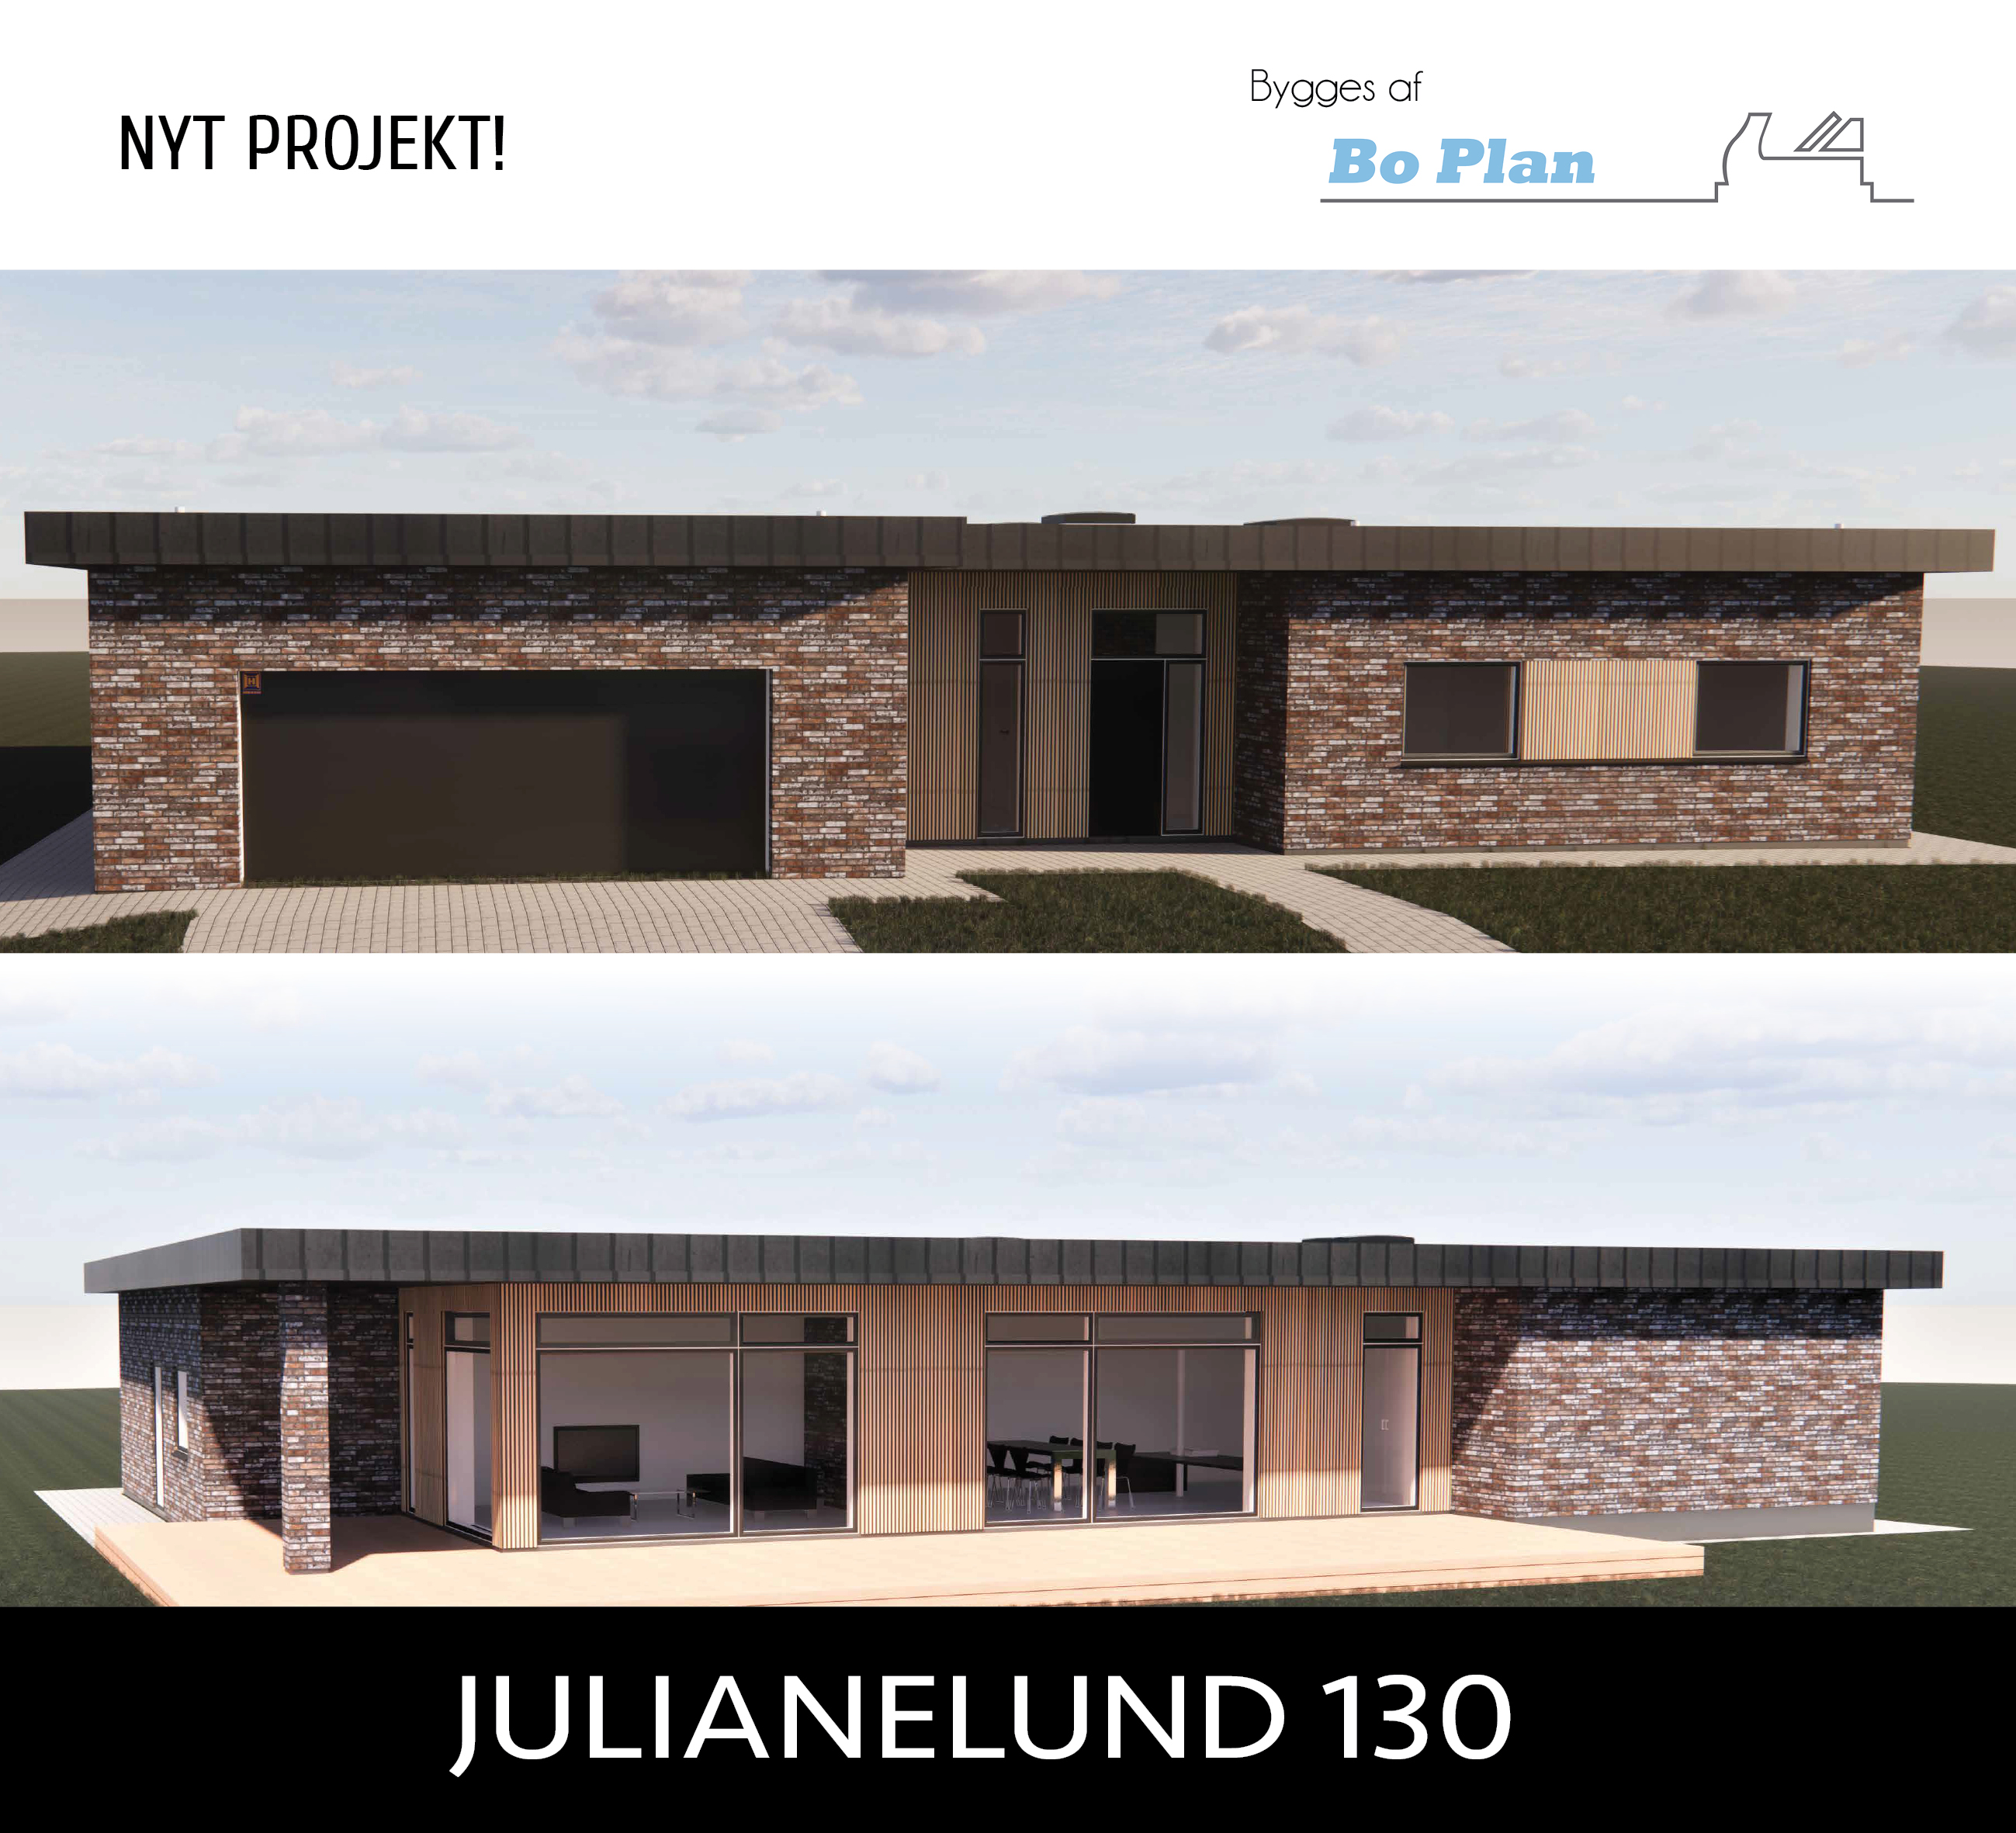 Julianelund 130